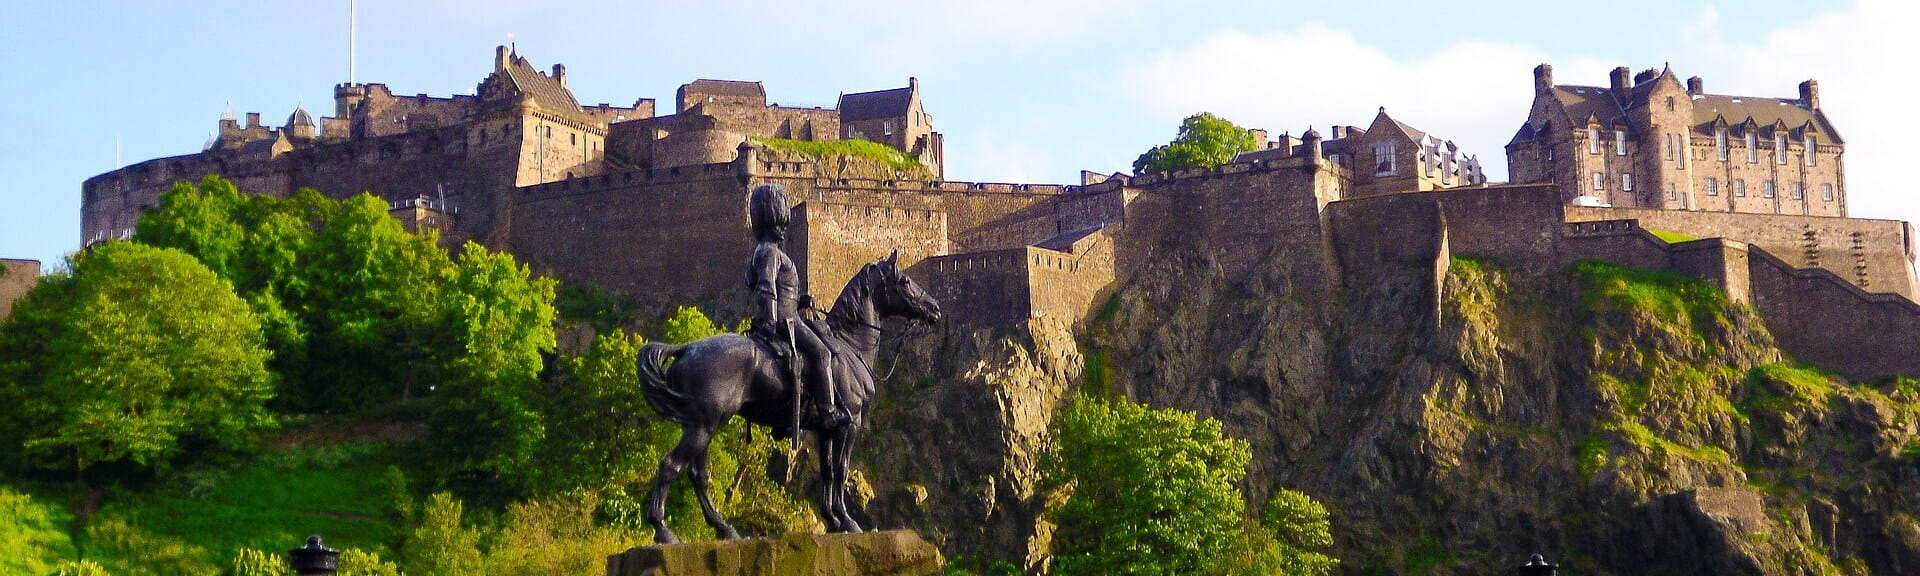 Klassenfahrt Edinburgh Burg Edinburgh Castle